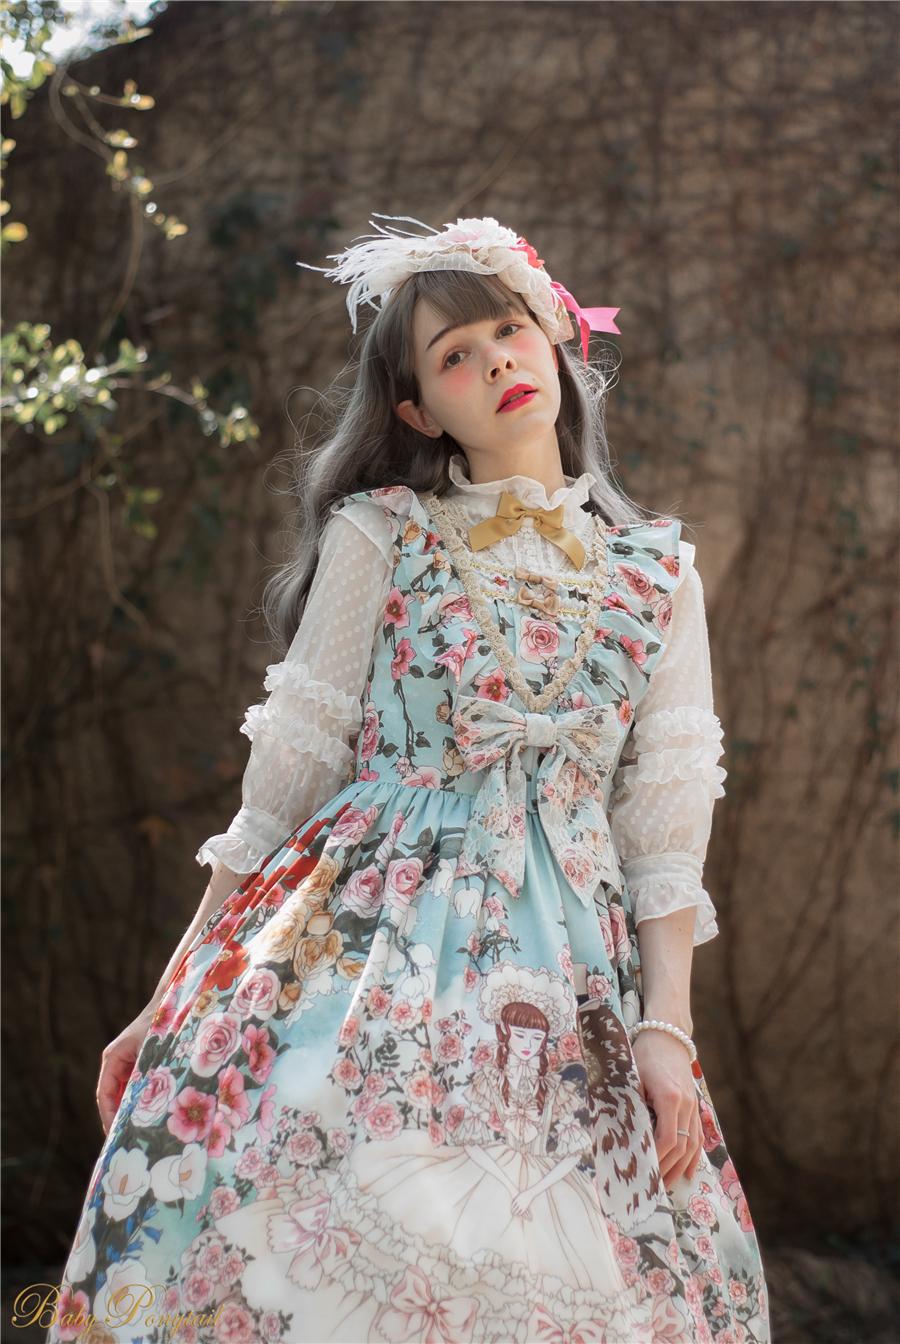 Baby Ponytail_Model Photo_Polly's Garden of Dreams_JSK Sky_Claudia05.jpg